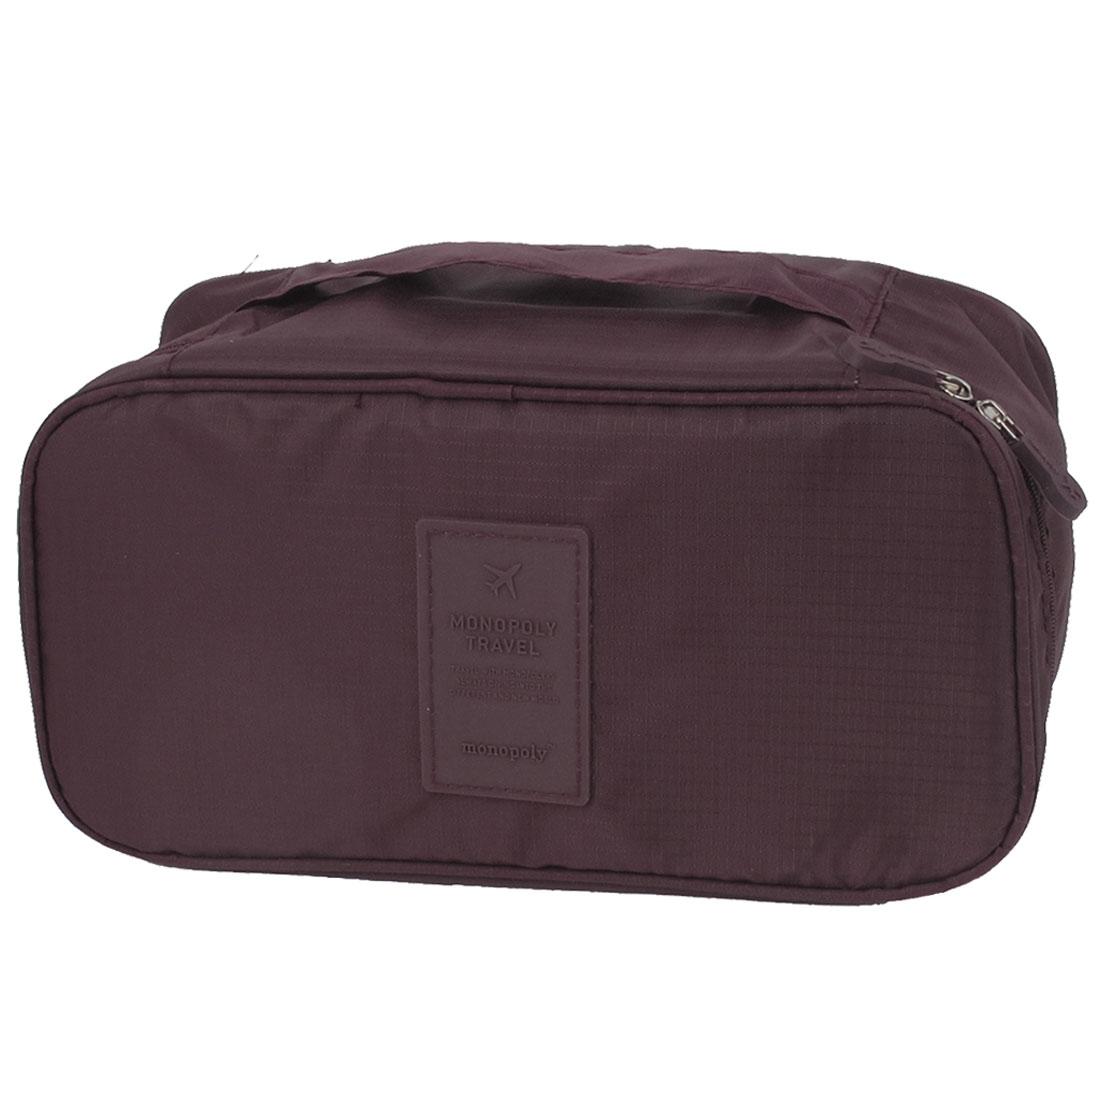 Women Travel Makeup Towel Underwear Bra Toiletry Wash Bag Handbag Burgundy